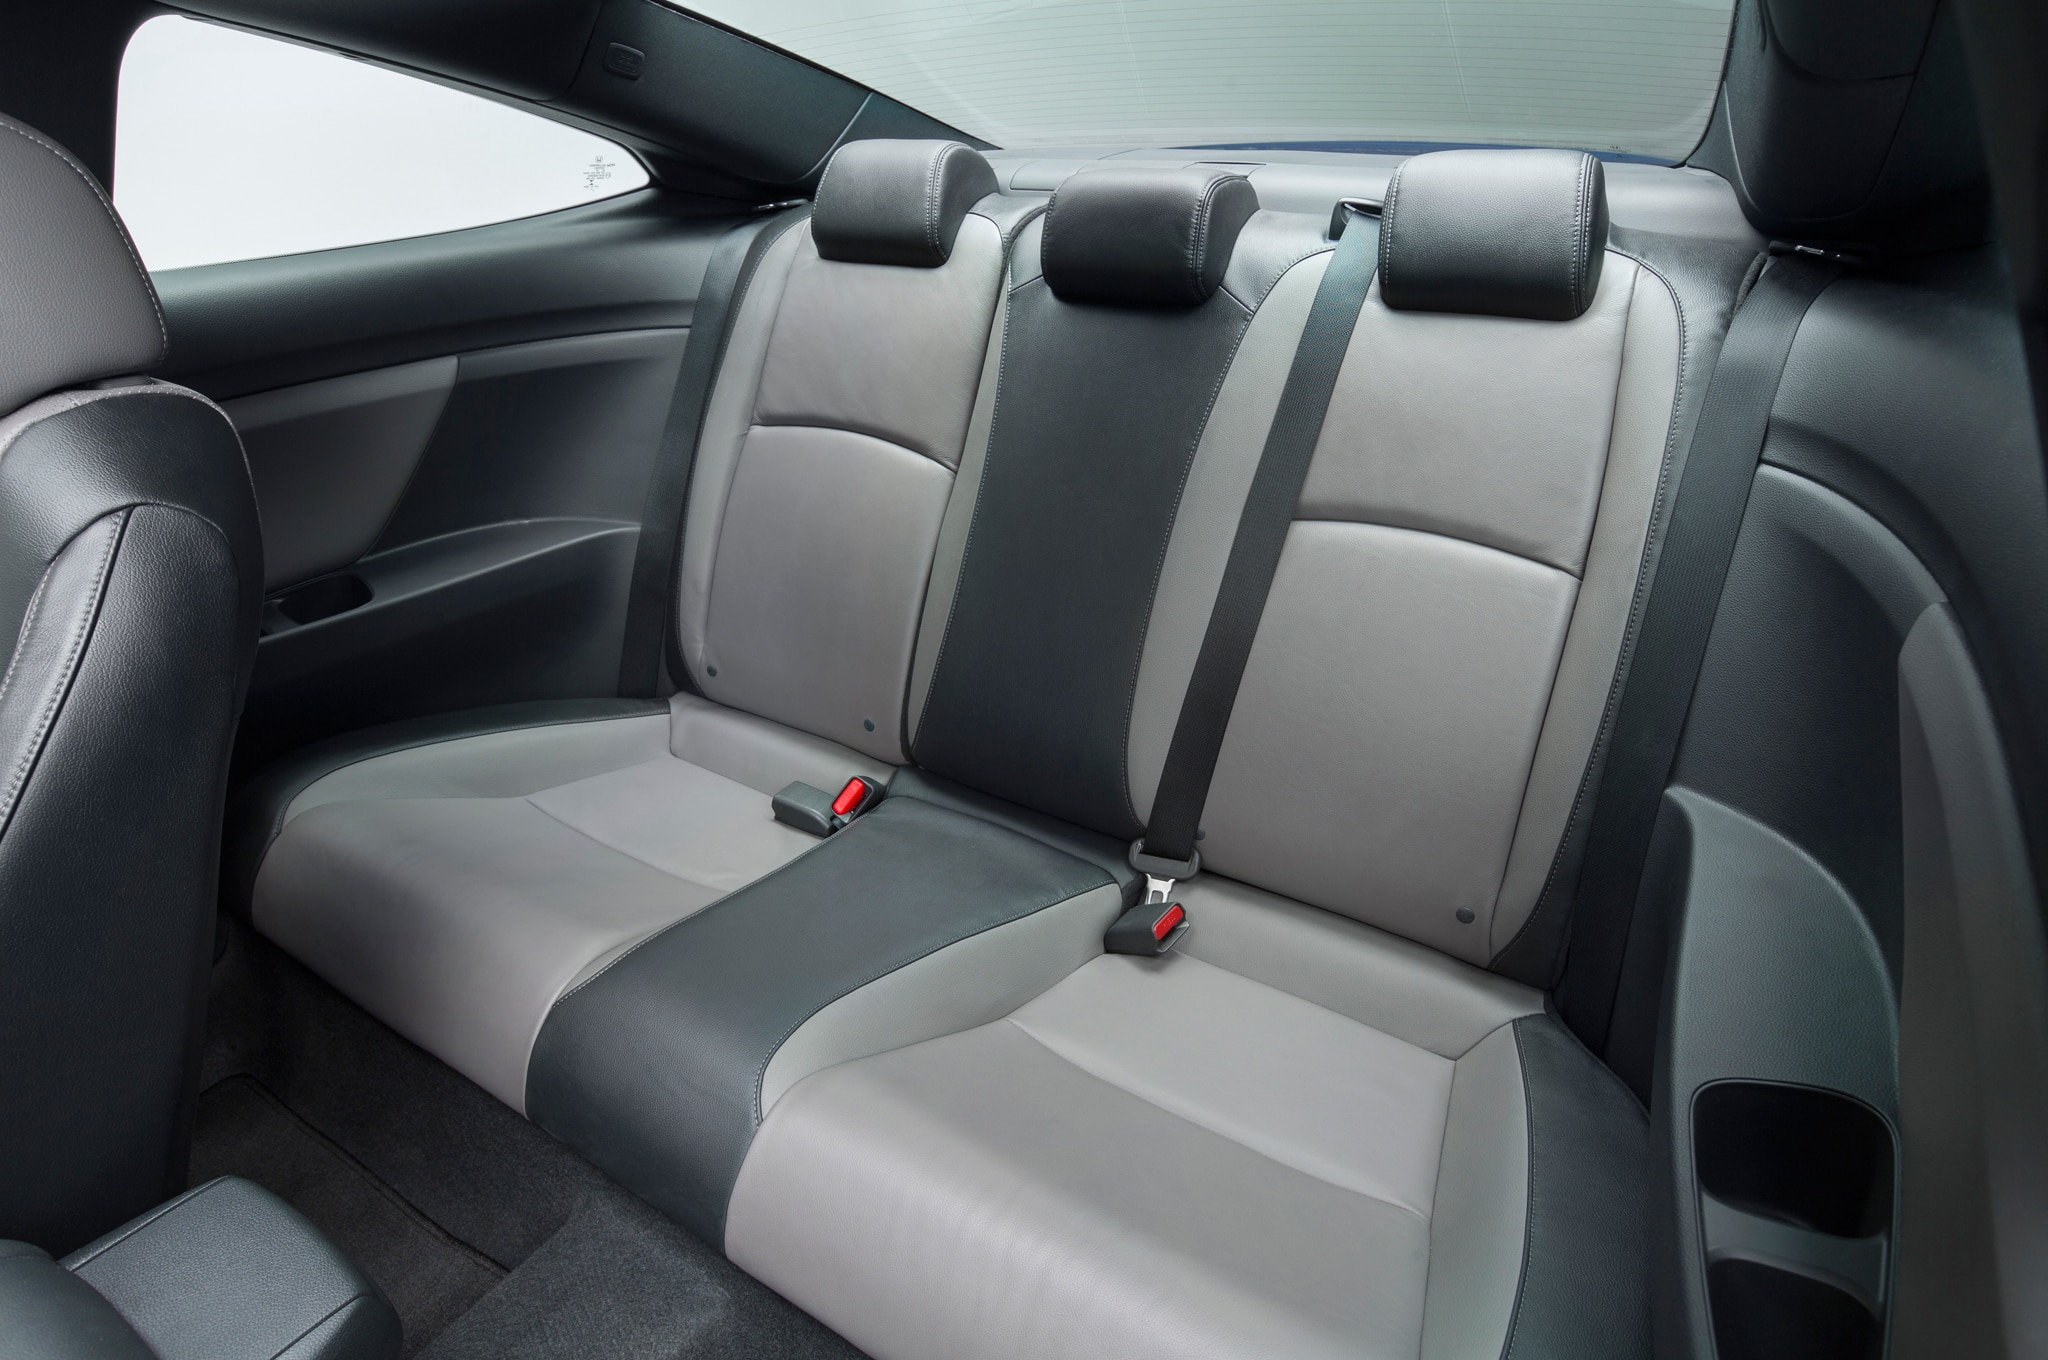 Image Result For Honda Civic Interiora